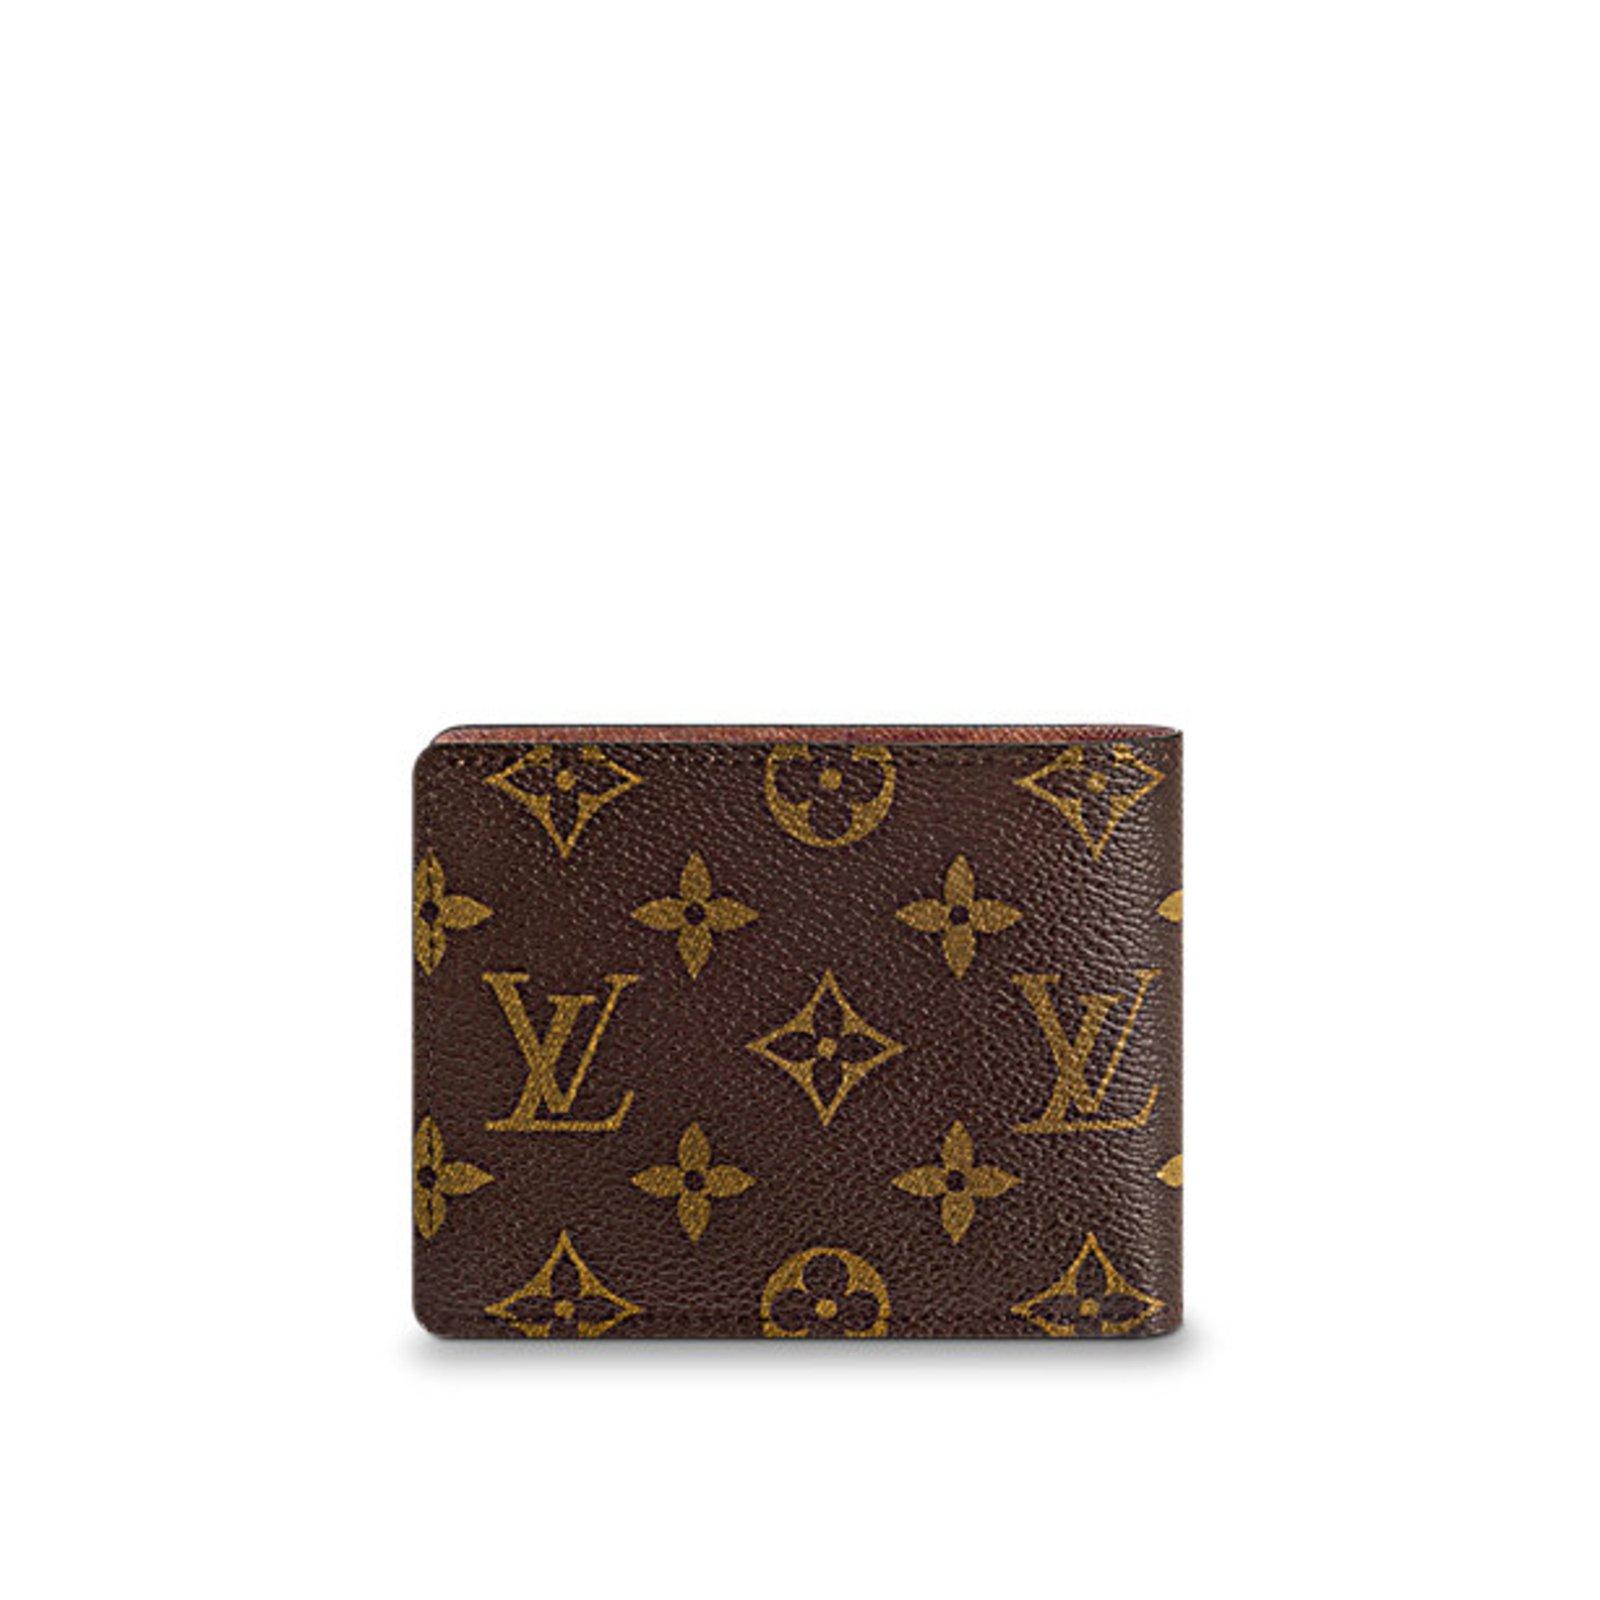 5f0ee0679eb Louis Vuitton Wallets Small accessories Wallets Small accessories Leather  Brown ref.63146 - Joli Closet